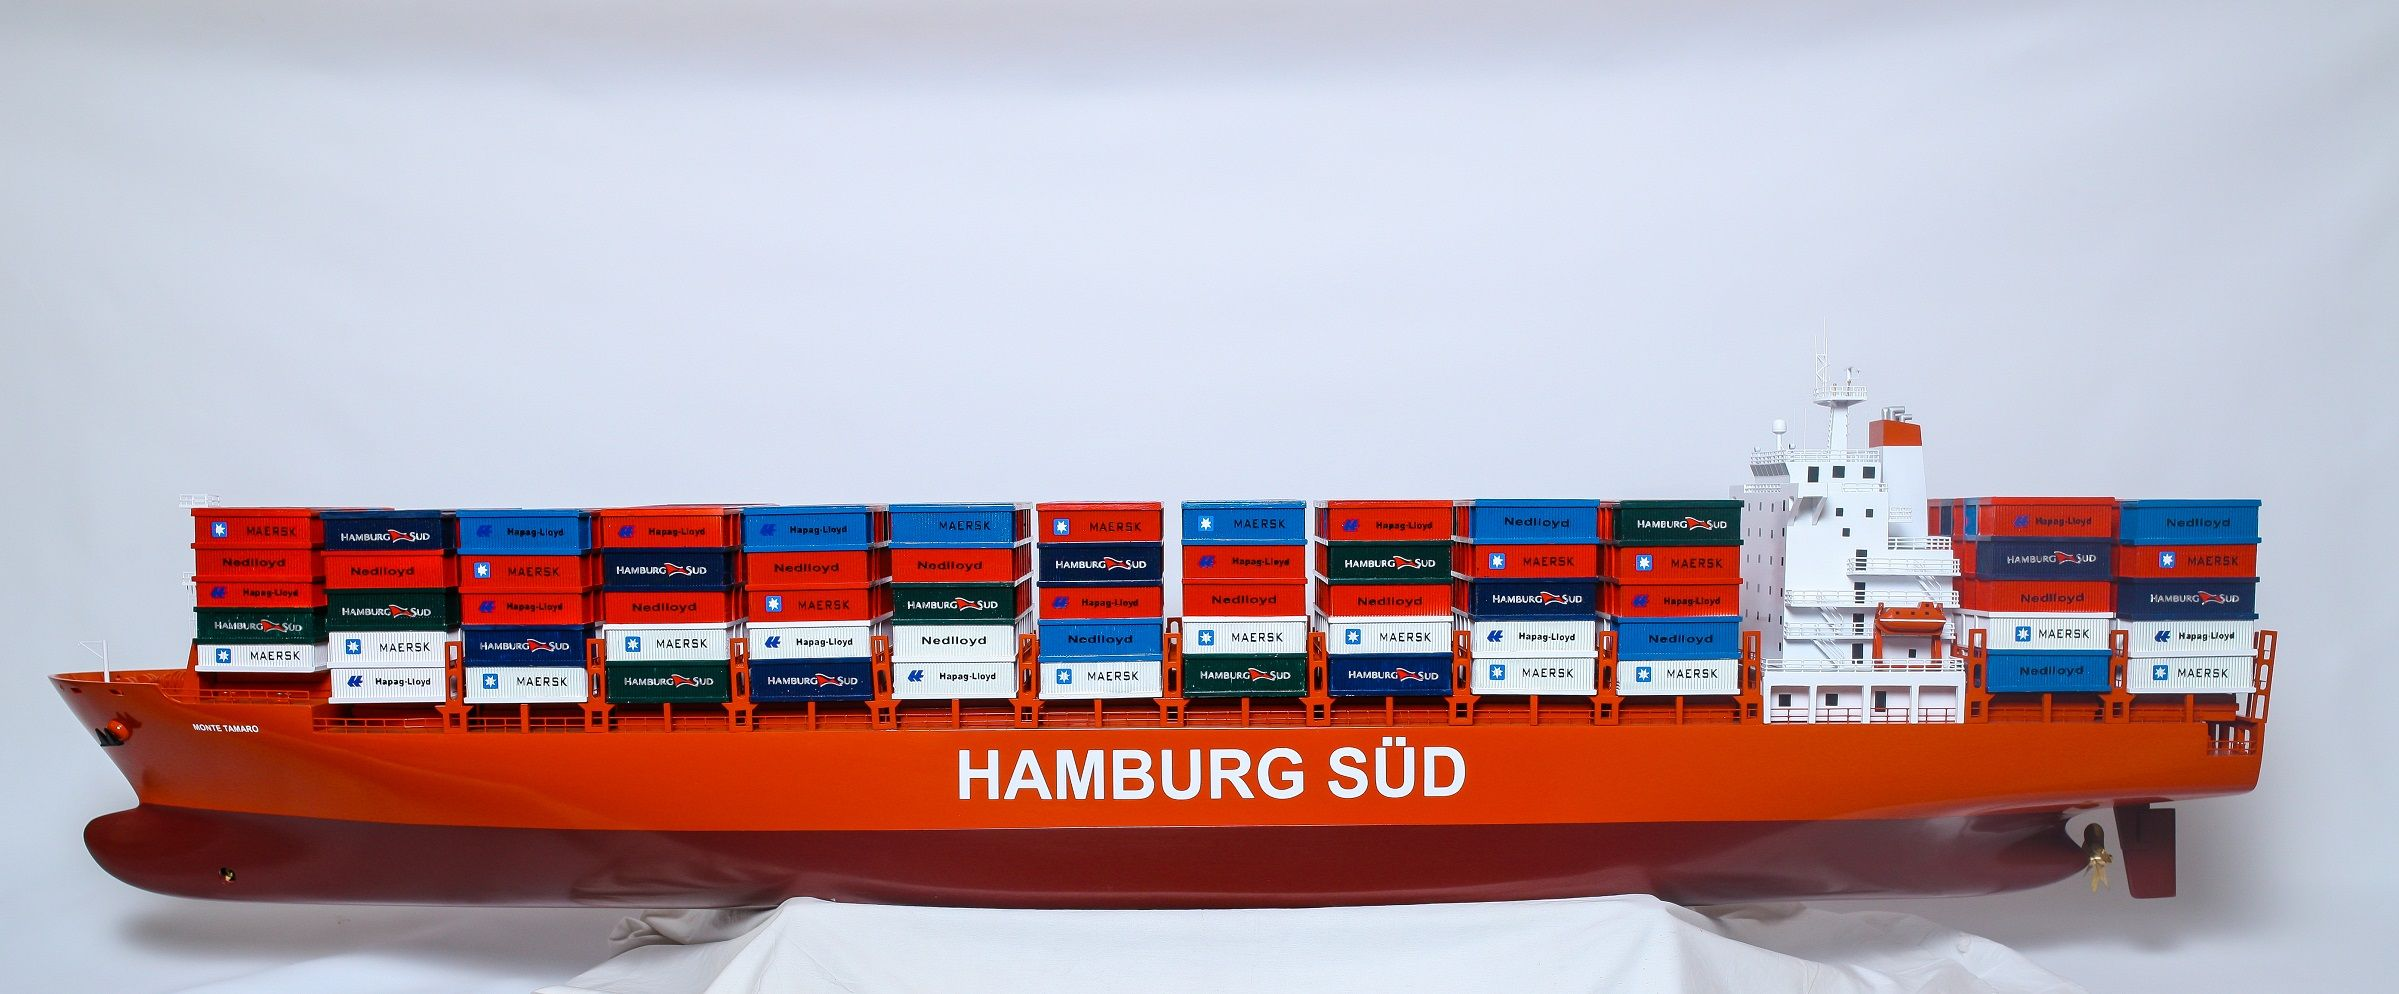 1527-9176-Hamburg-Sud-Container-Ship-Model